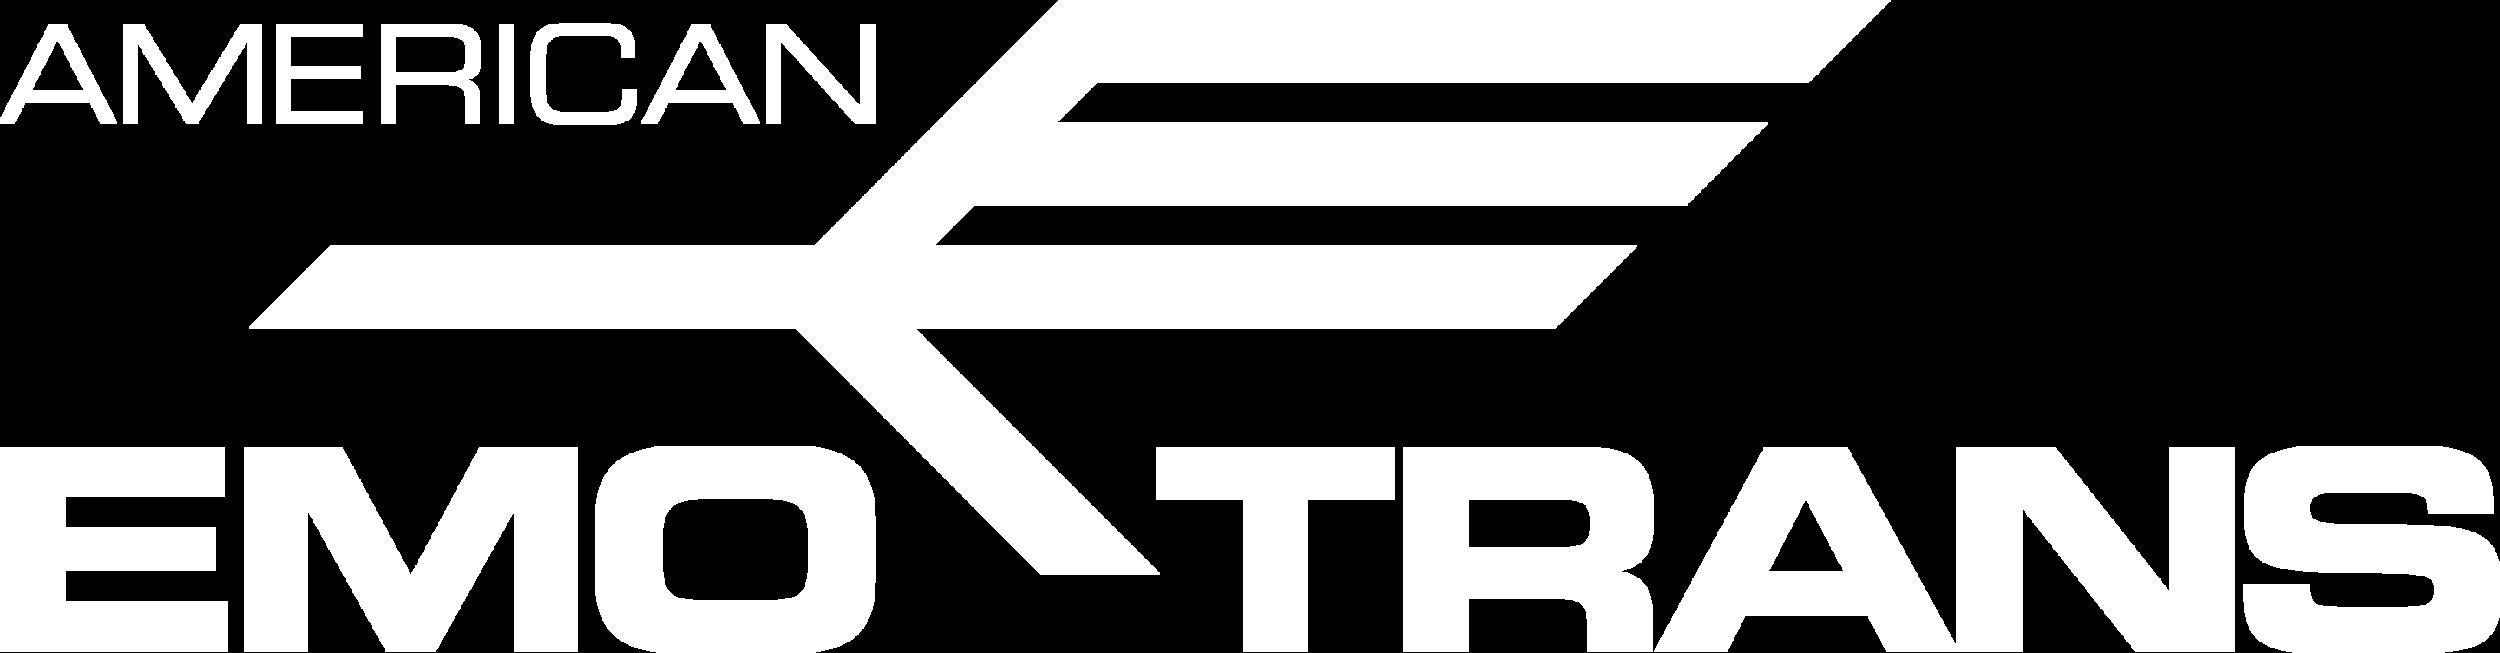 American Emo Trans, Inc.